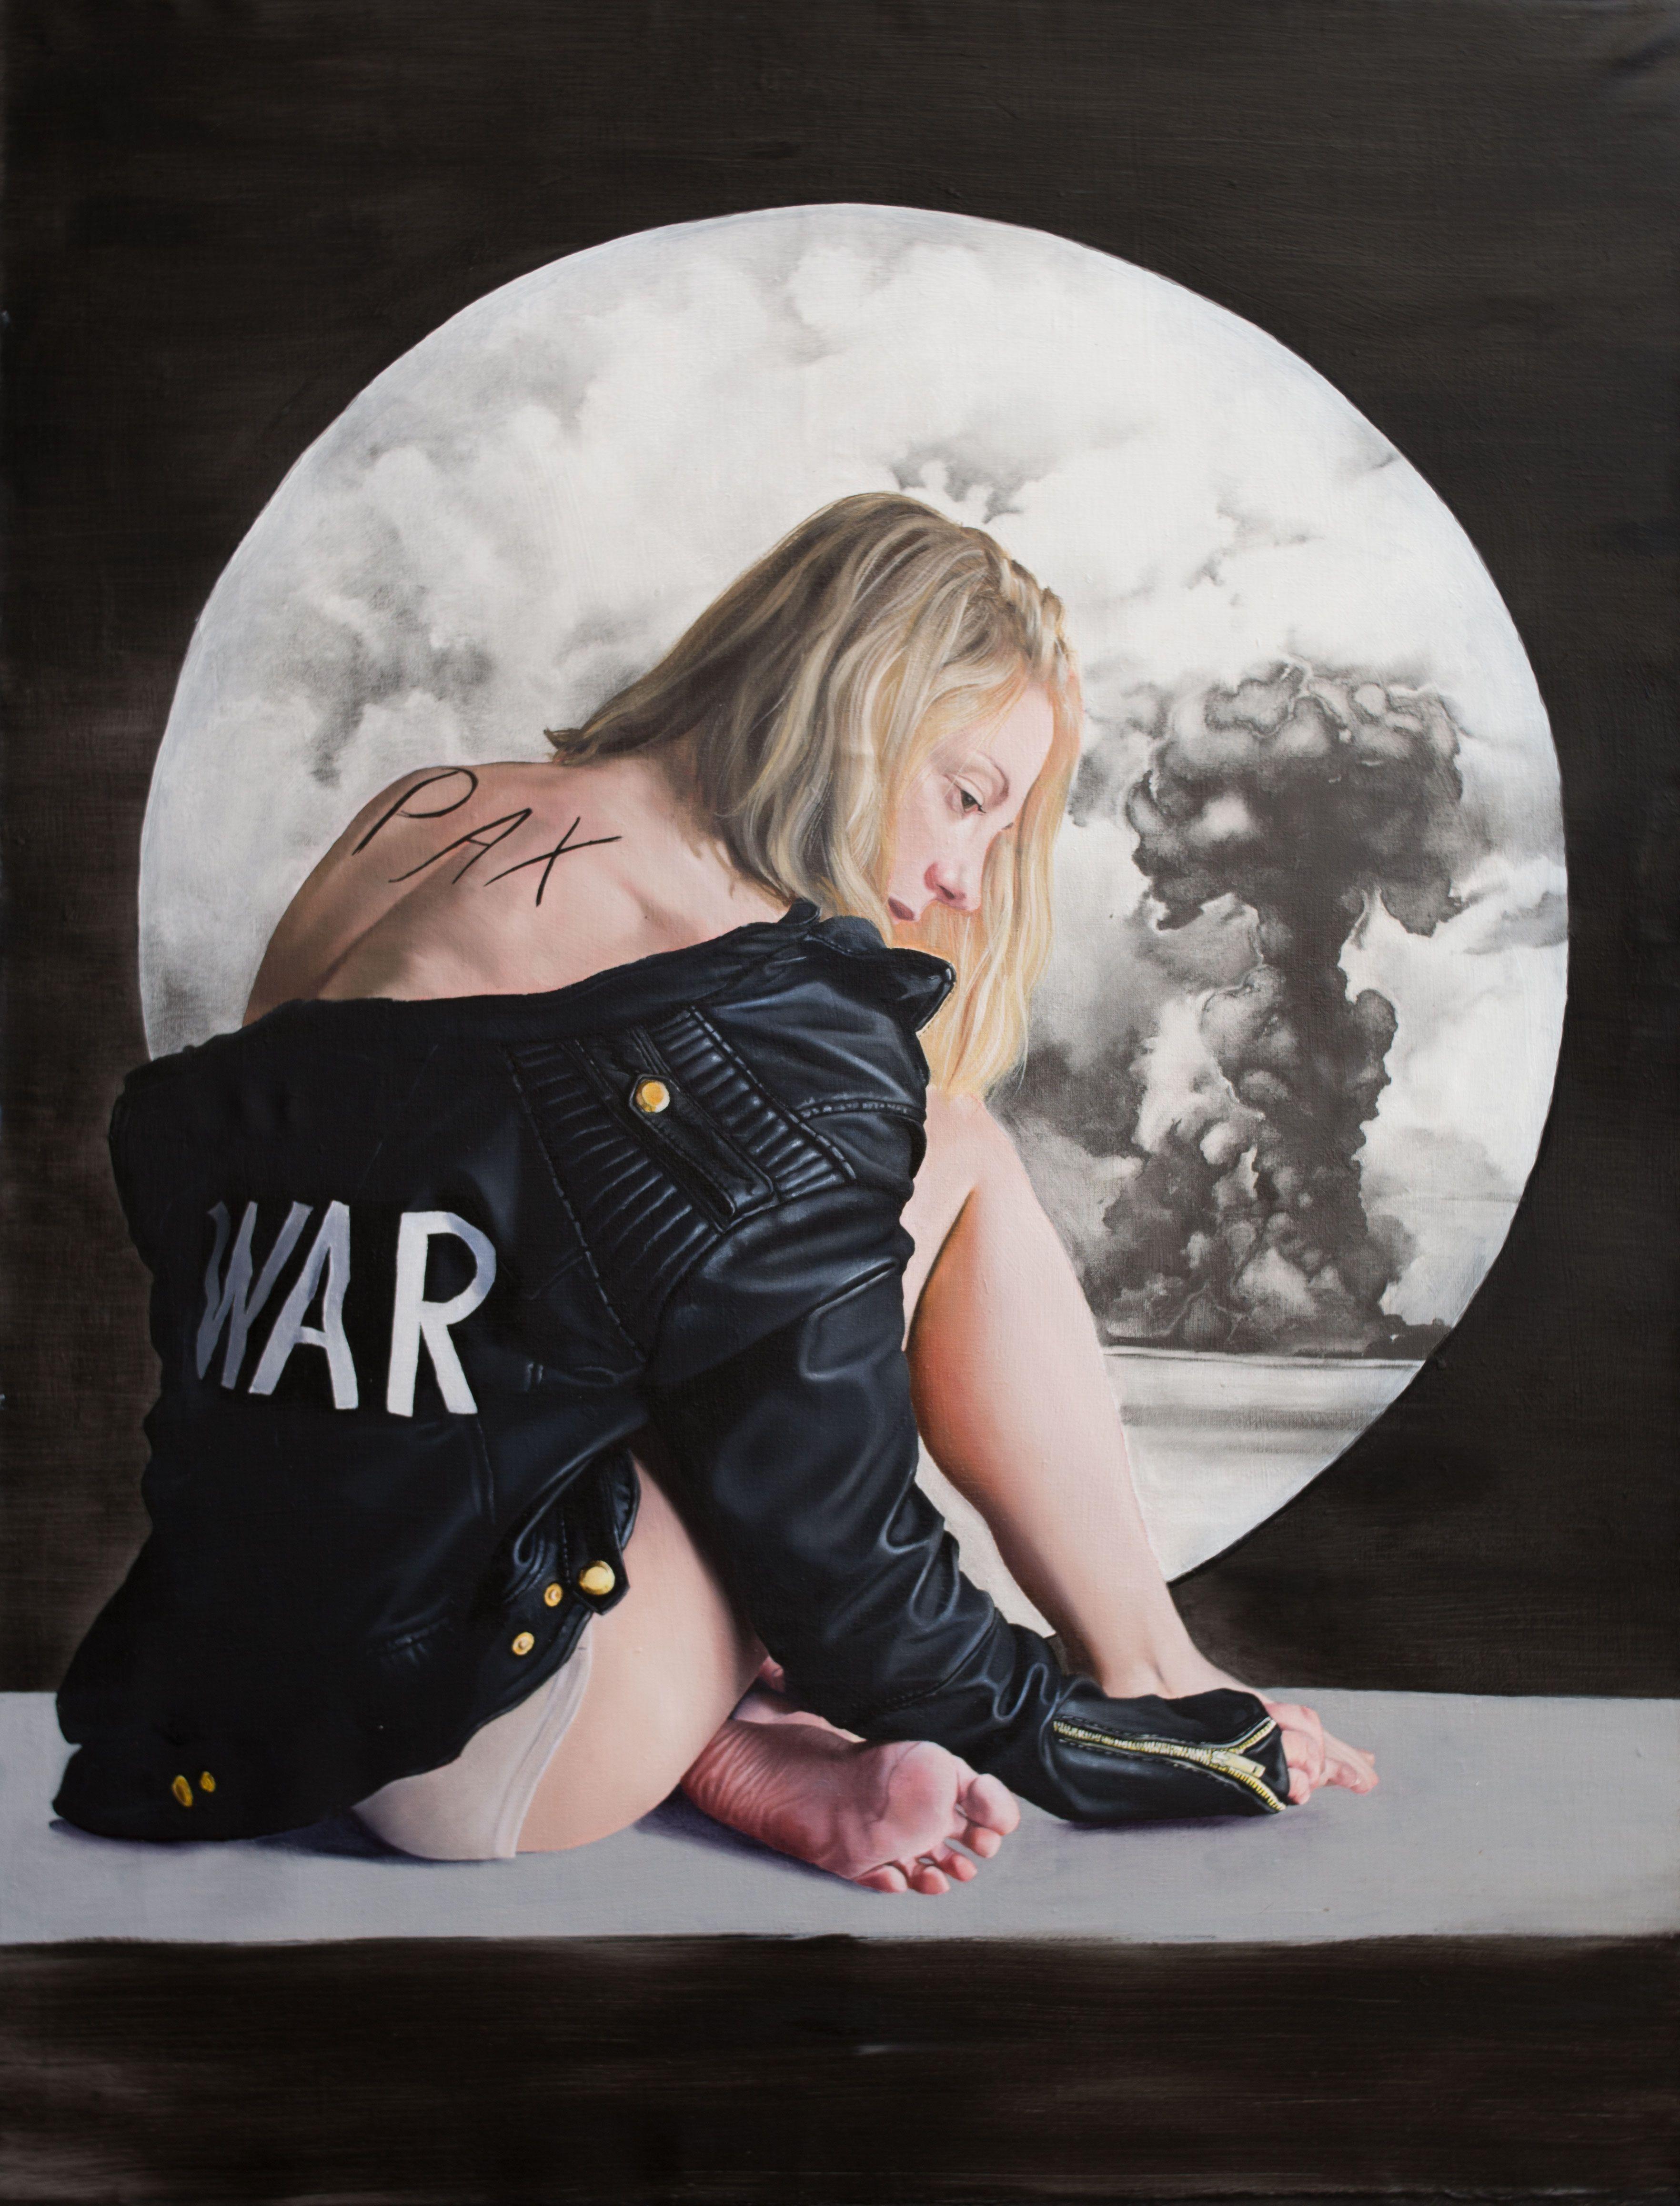 War; horsemen of apocalypse; oil on canvas; 150x115cm  fajcikova.com